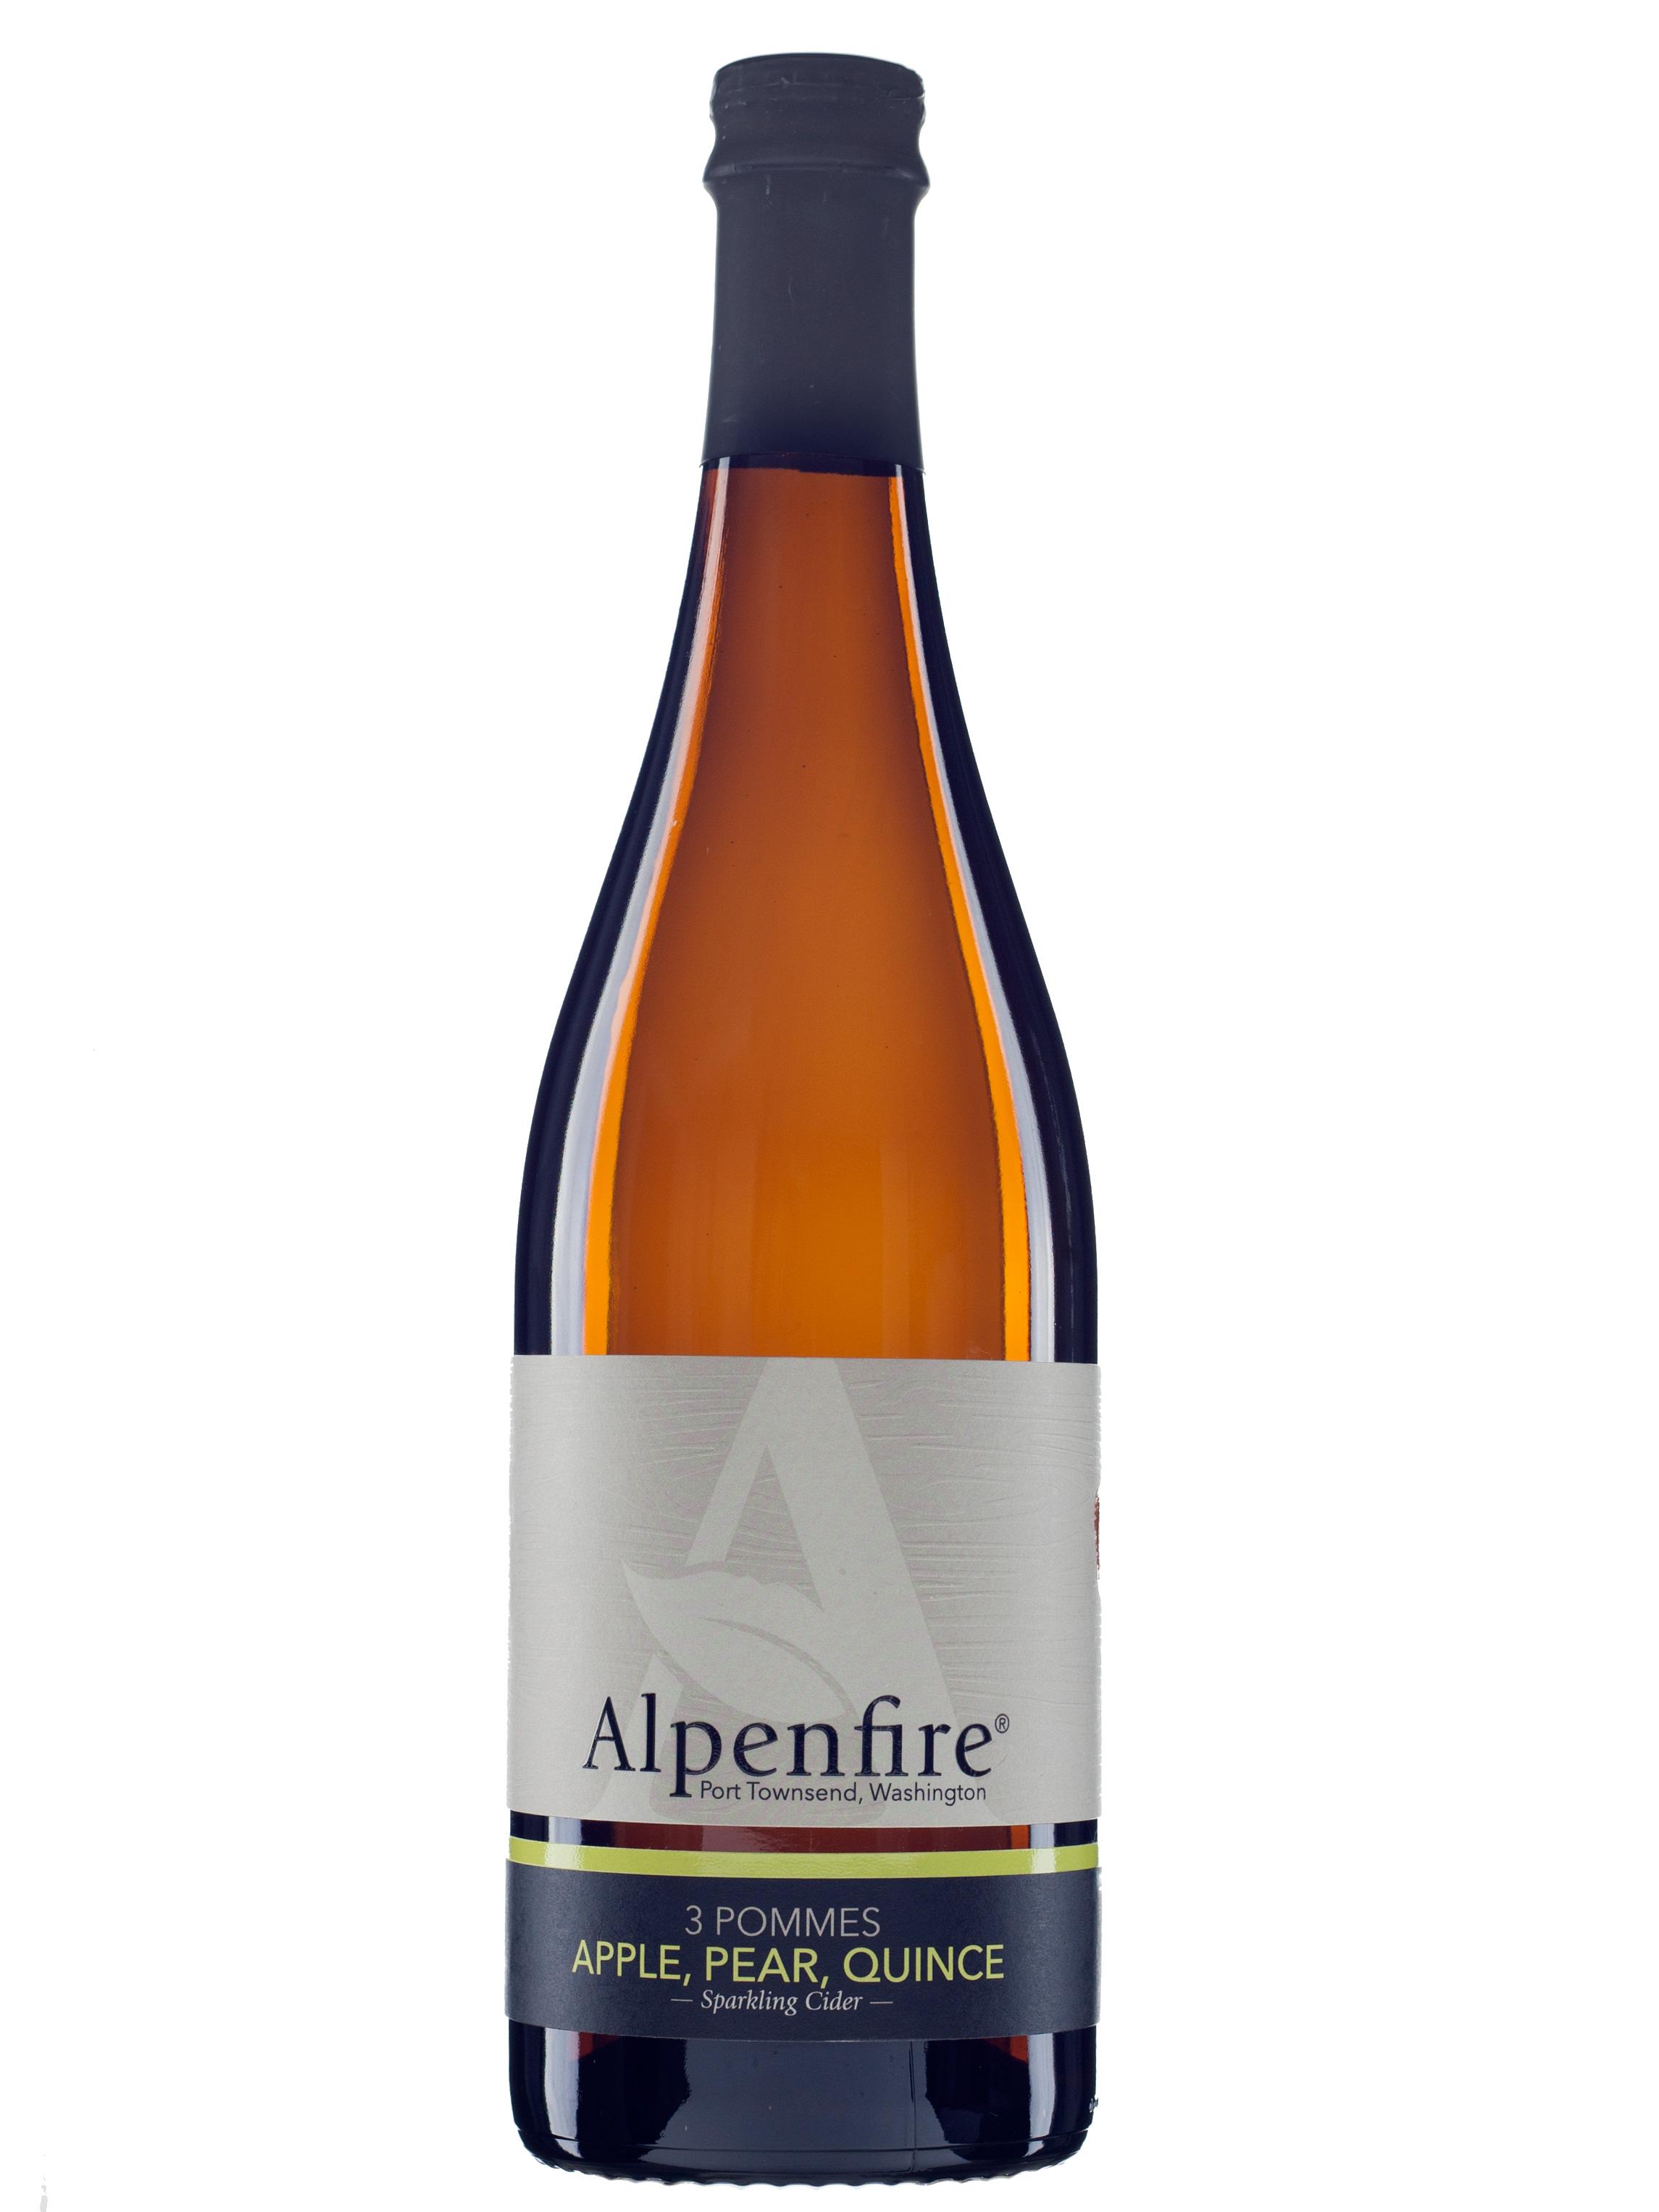 Alpenfire-3Pommes-Apple-Pear-Quince-Sparkling-Cider.jpg